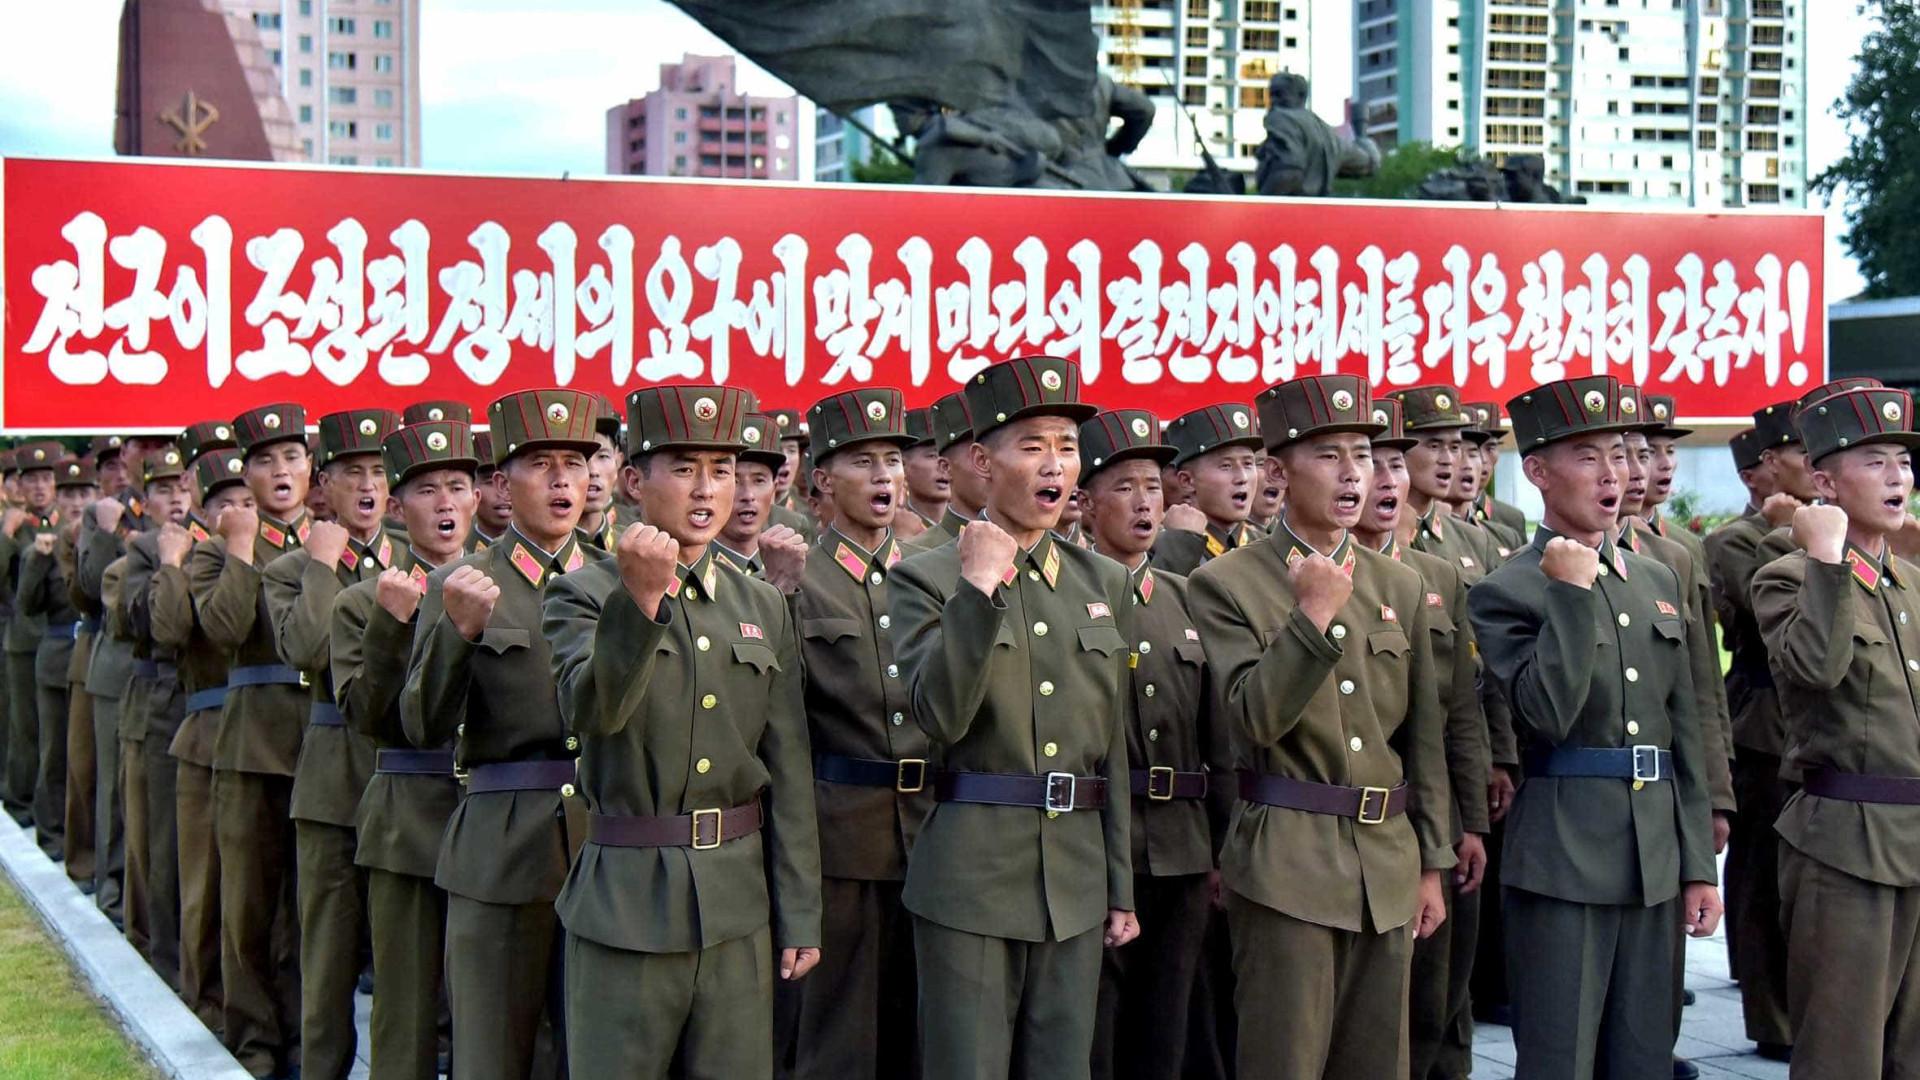 Trump: Coreia do Norte deve se organizar ou terá problemas